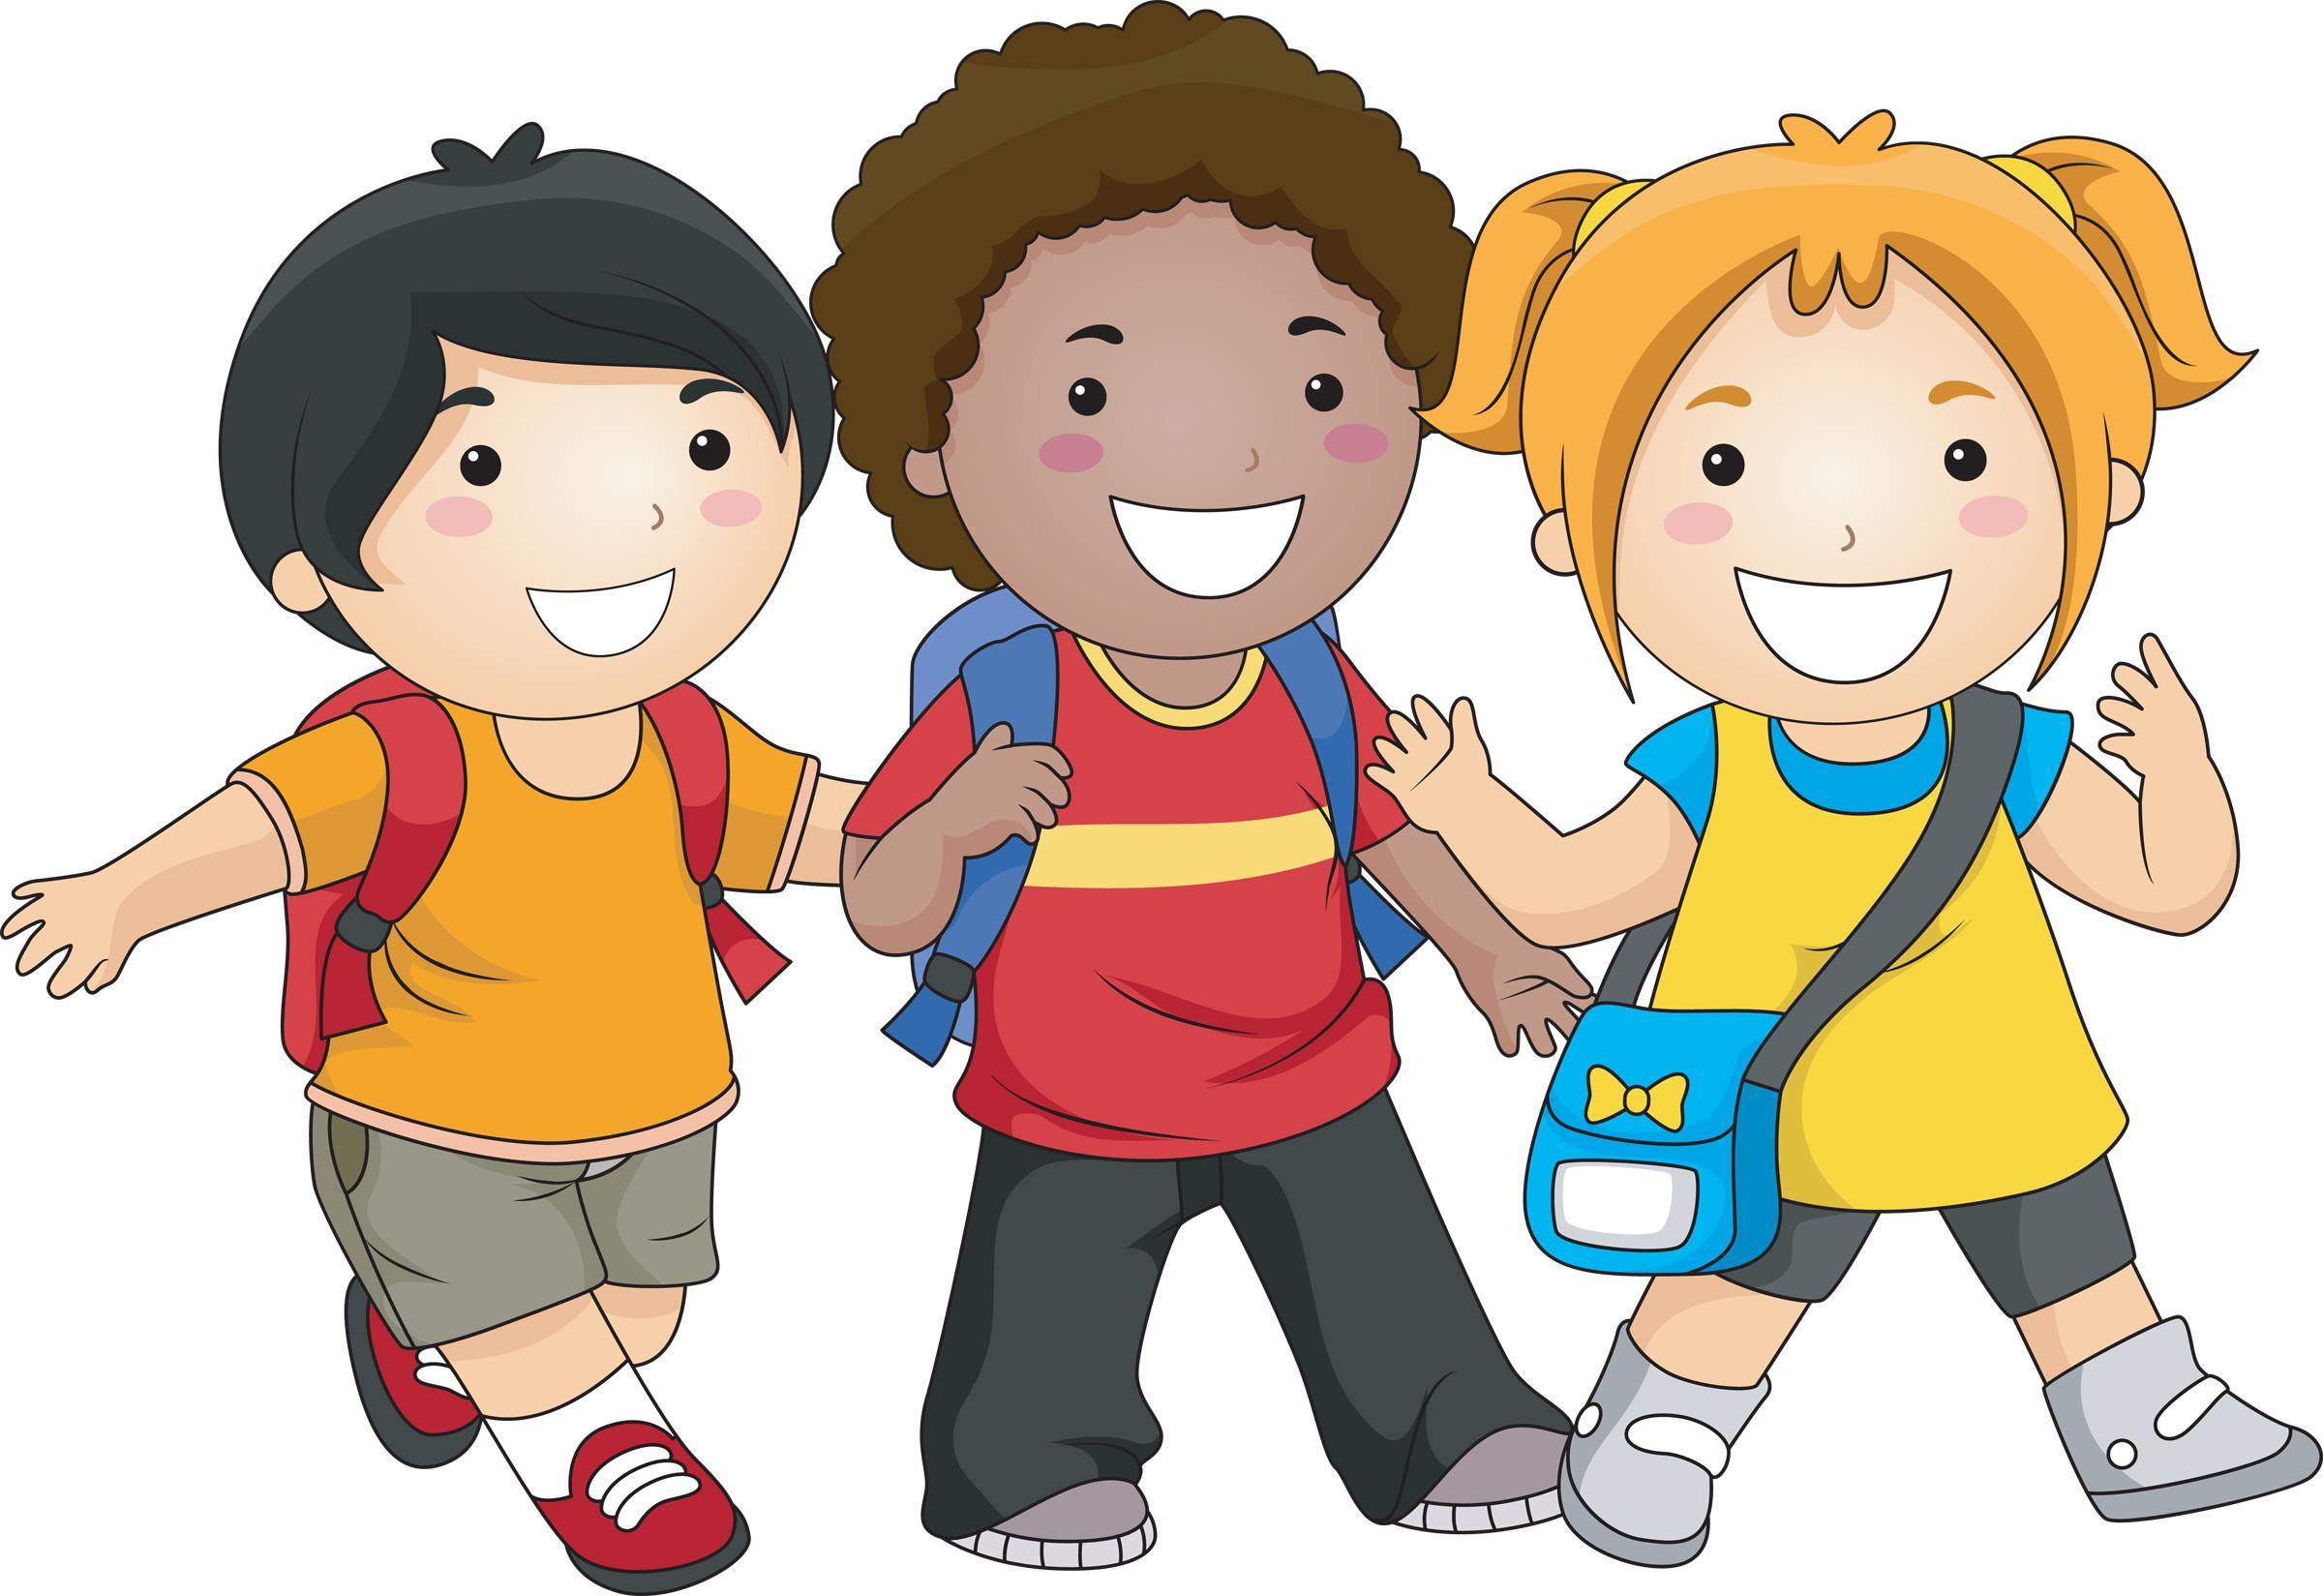 Friendship clipart many friend. Best free download